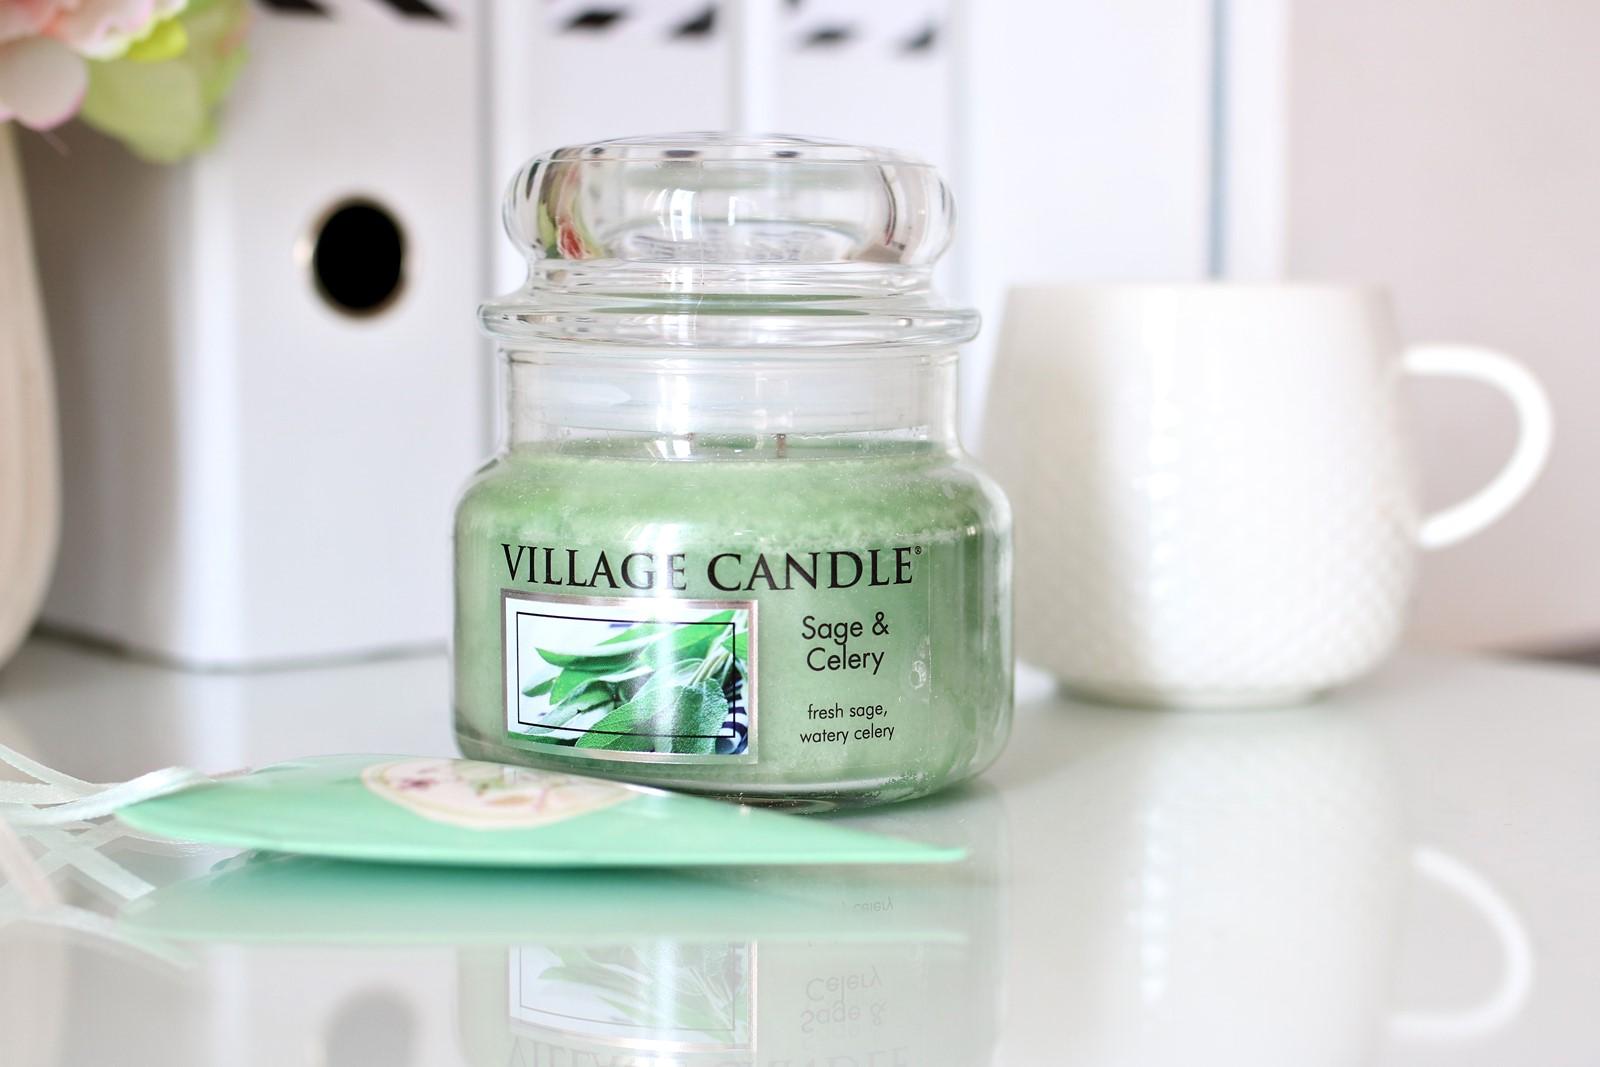 Świeca zapachowa Village Candle - Sage and Celery {idealna na sezon wiosenno-letni}